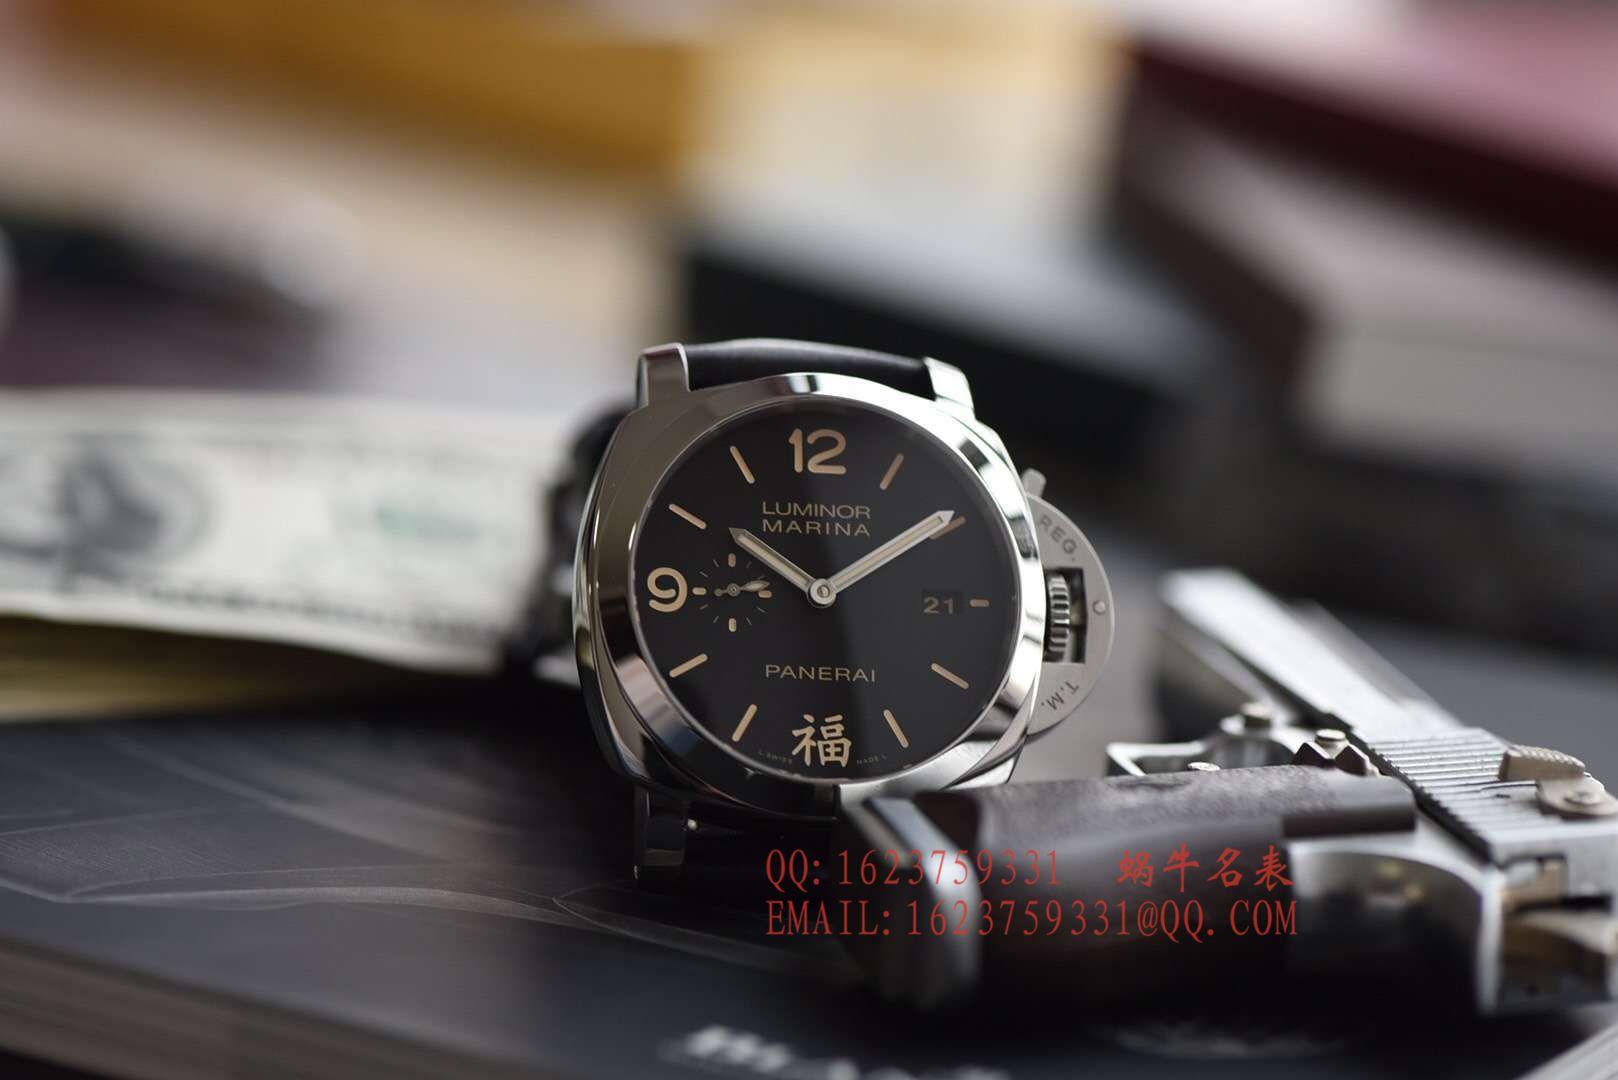 【VS一比一超A高仿手表】沛纳海LUMINOR系列PAM00498腕表 / VSBCPAM00498